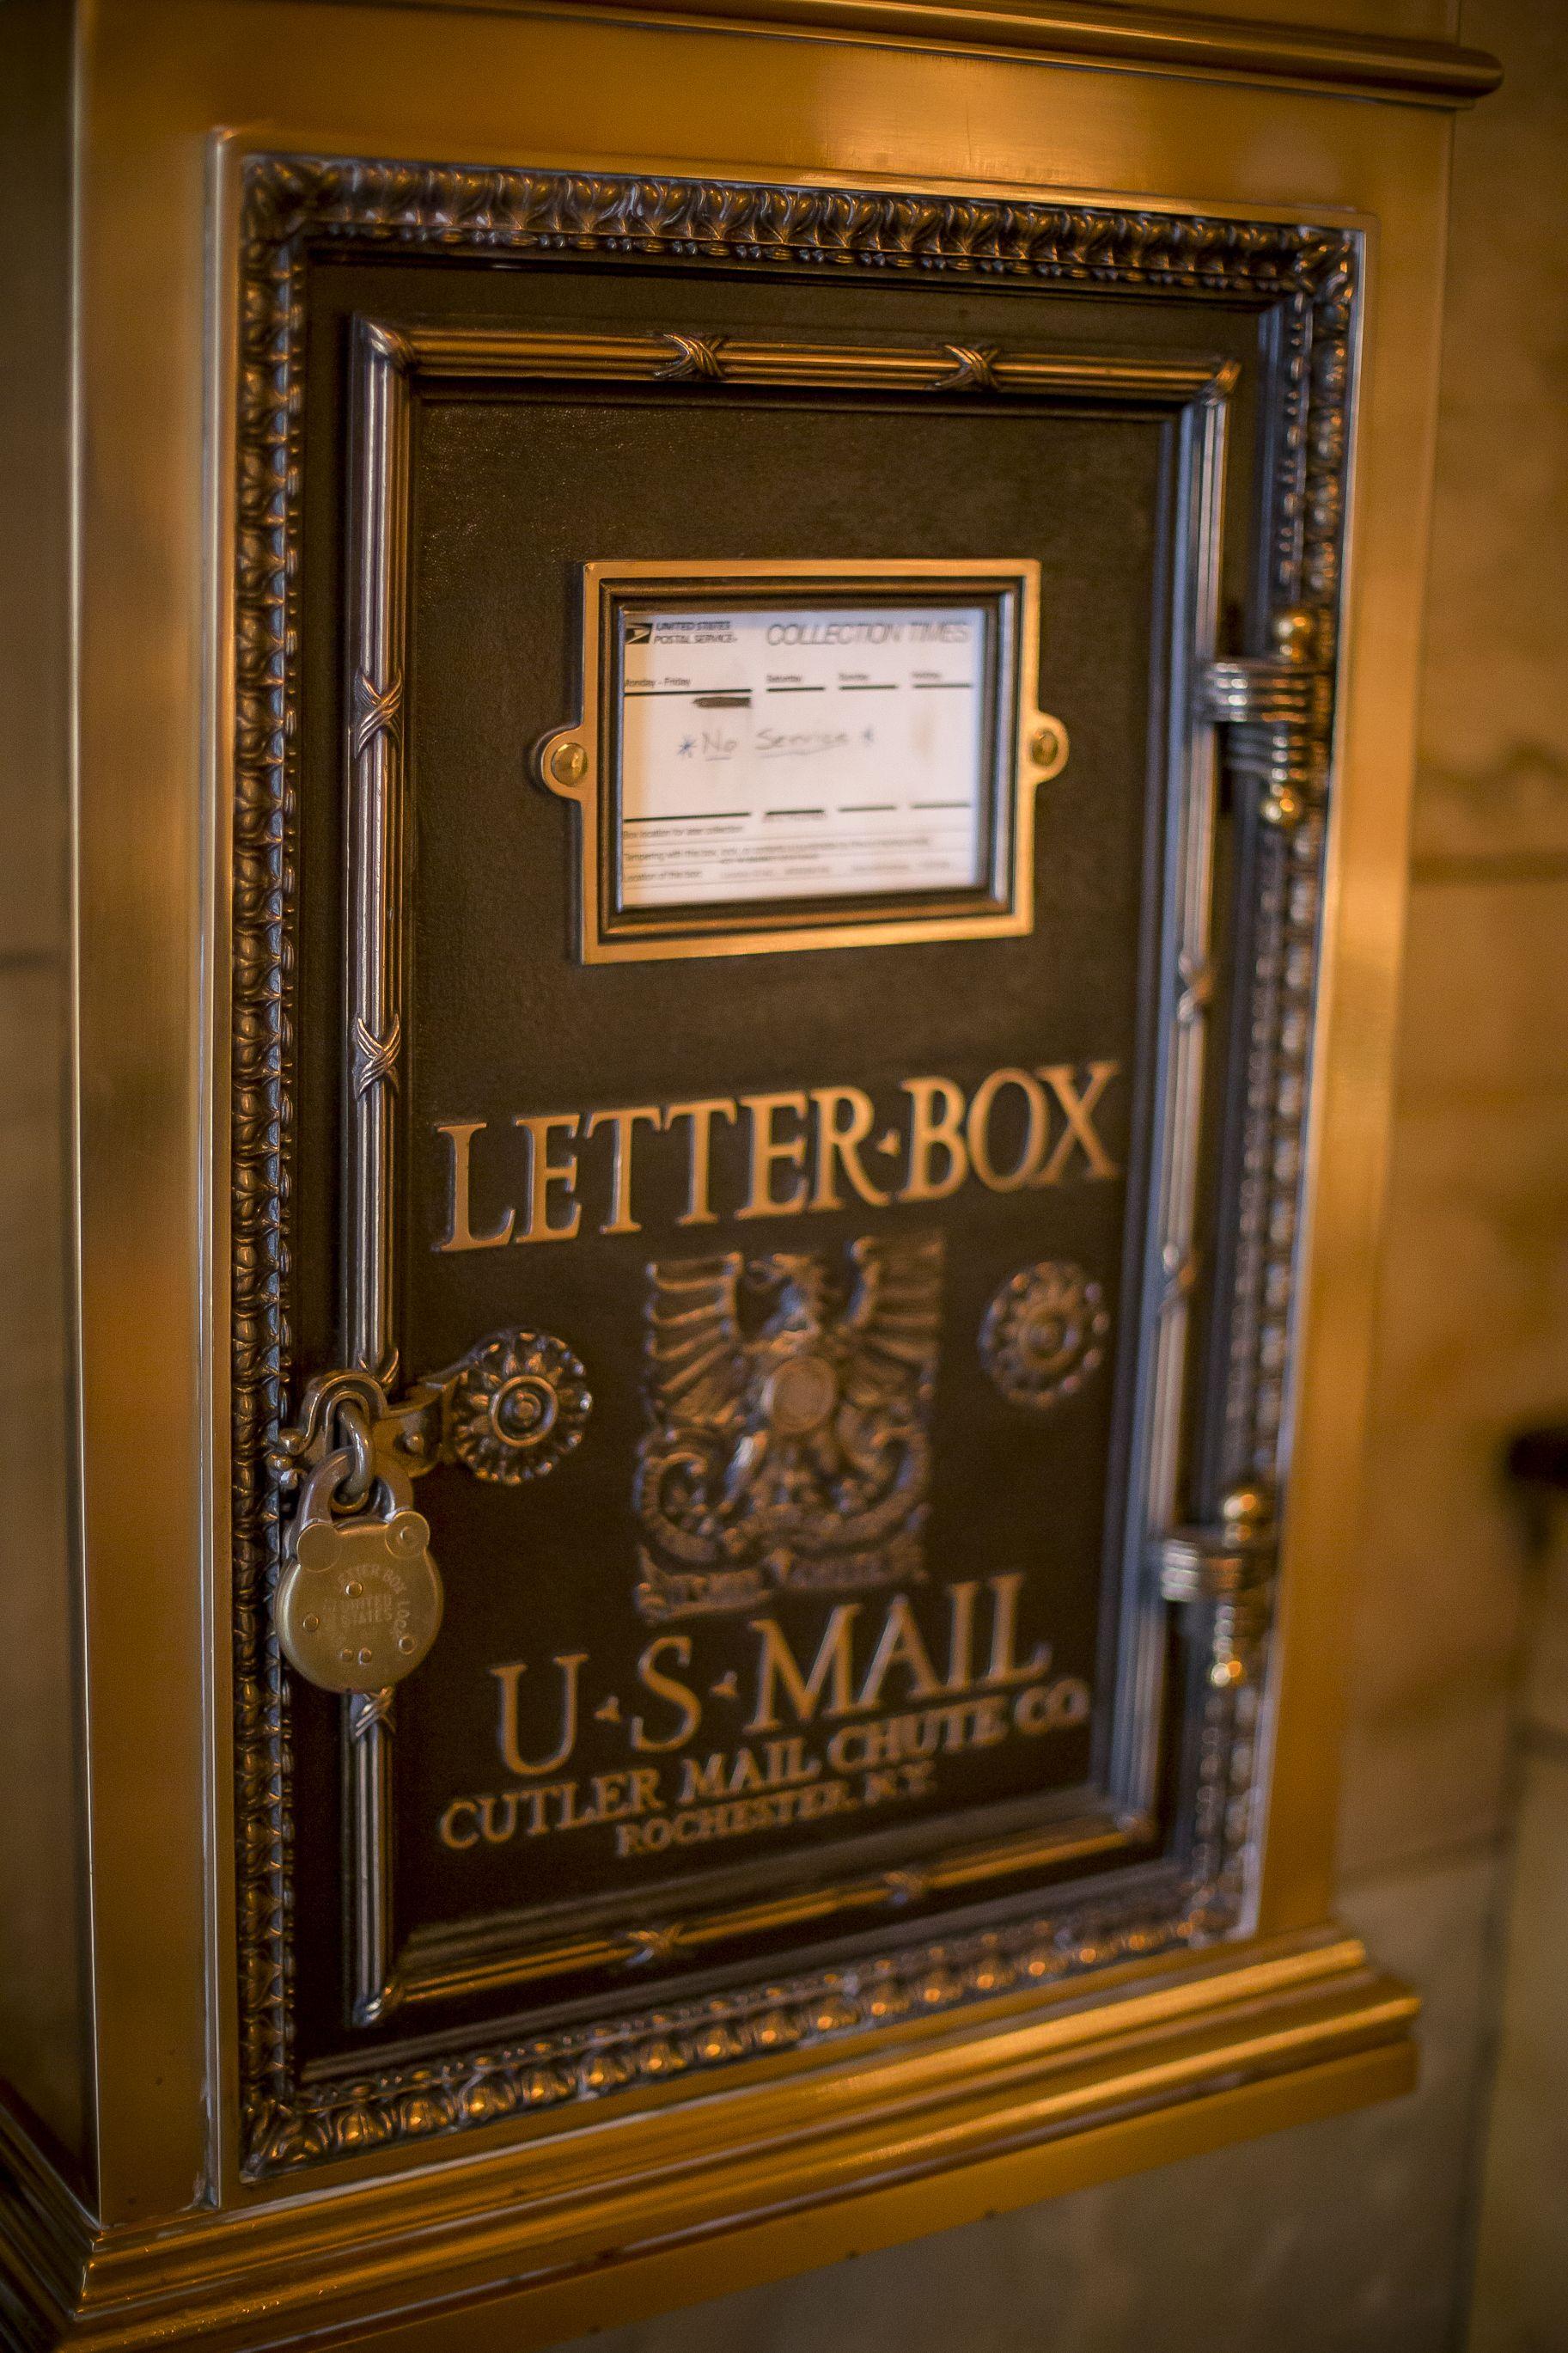 Original Drop Box Located in Foyer